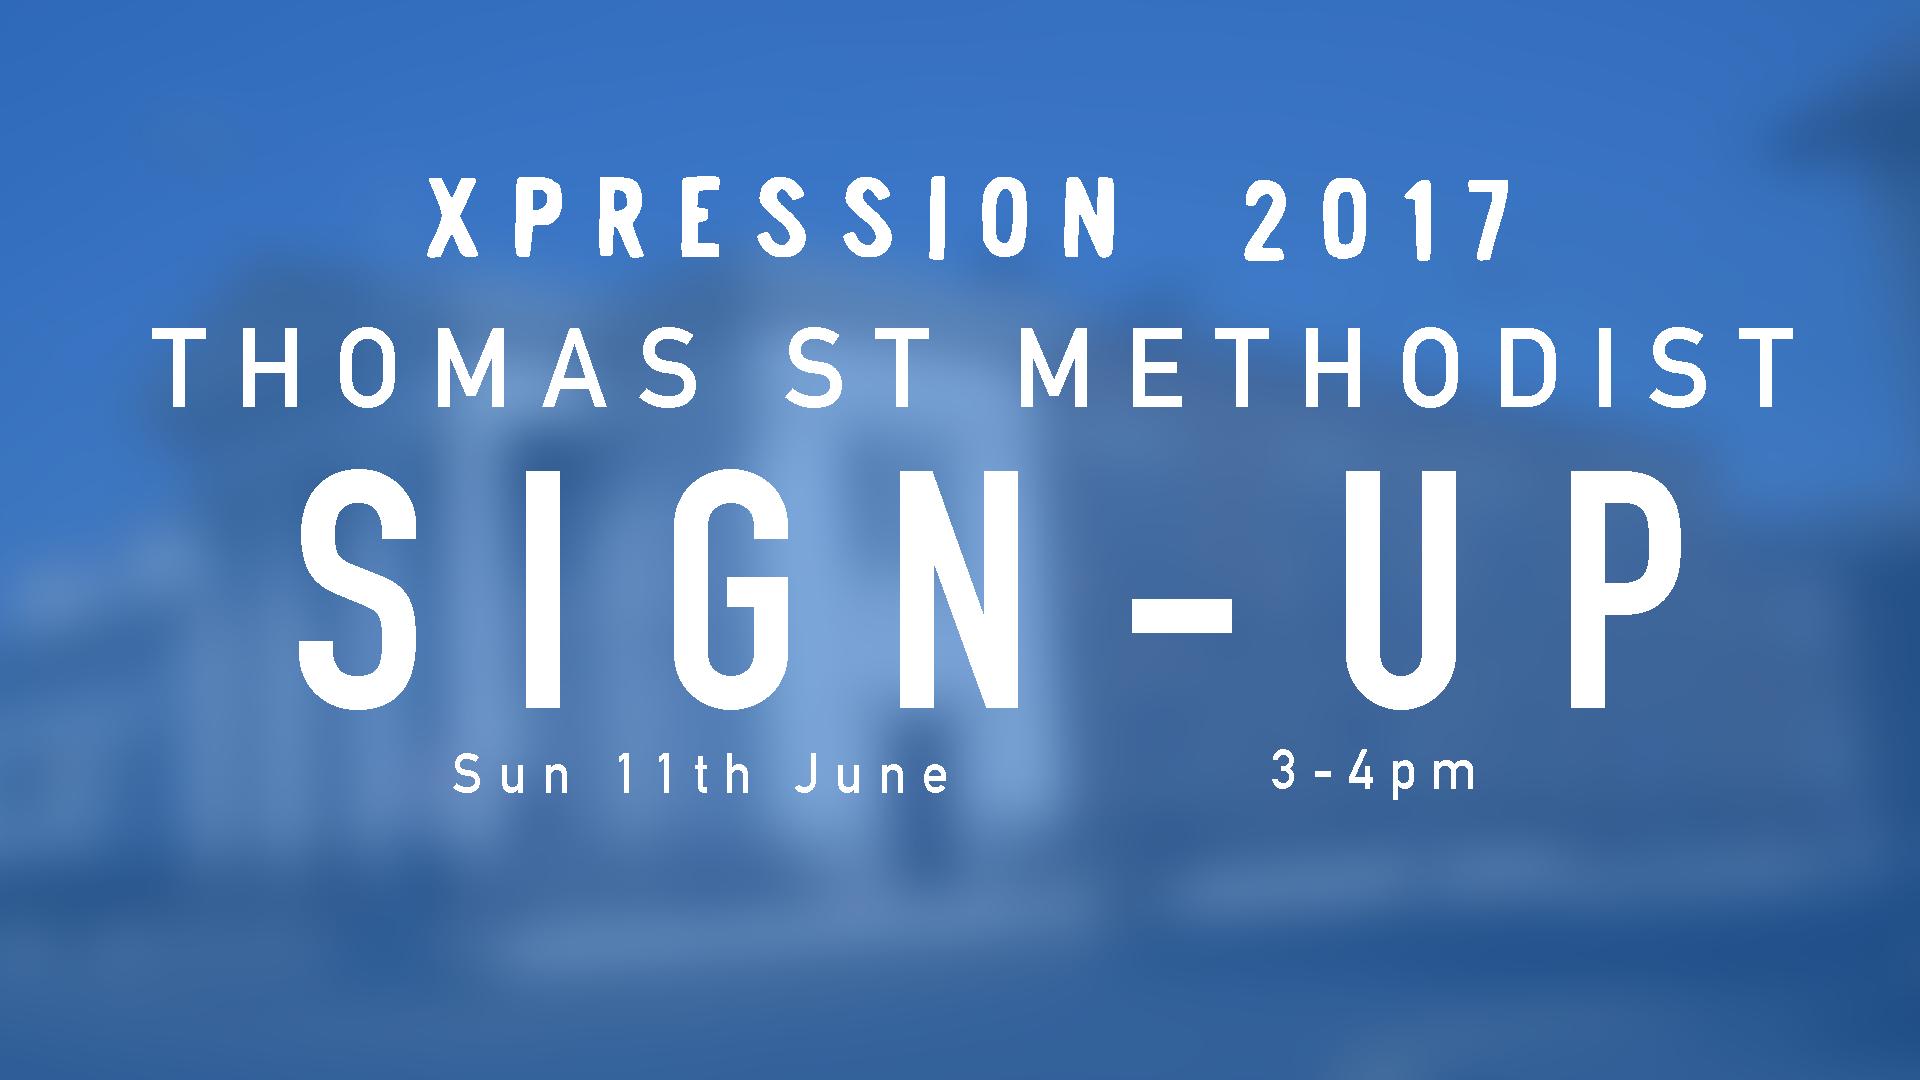 2nd Sign-Up Event - Thomas Street Methodist, Thomas Street, Portadown